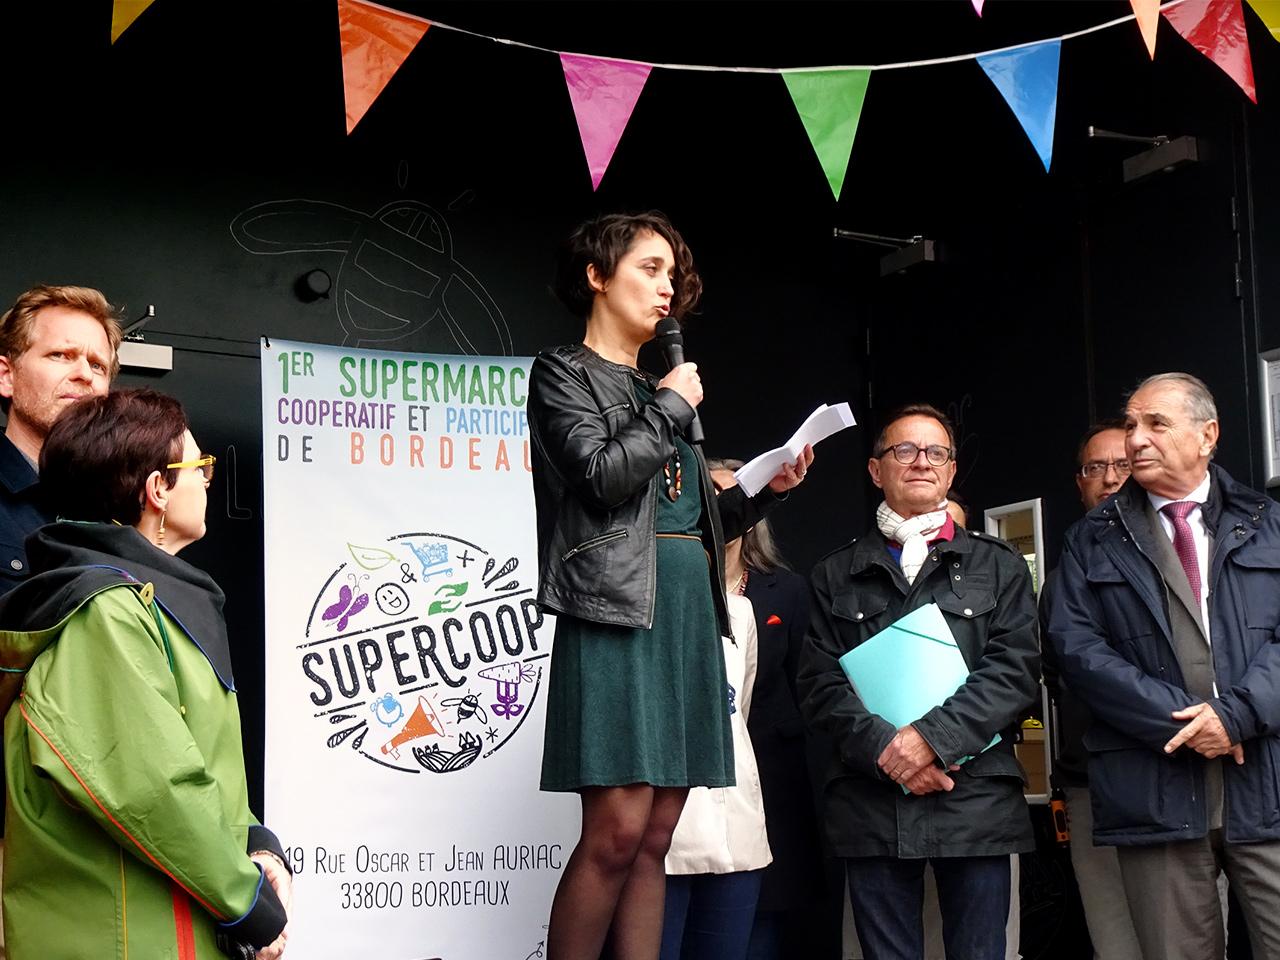 Tribune lors de l'inauguration du 17 mai à Supercoop rue Oscar et Jean Auriac